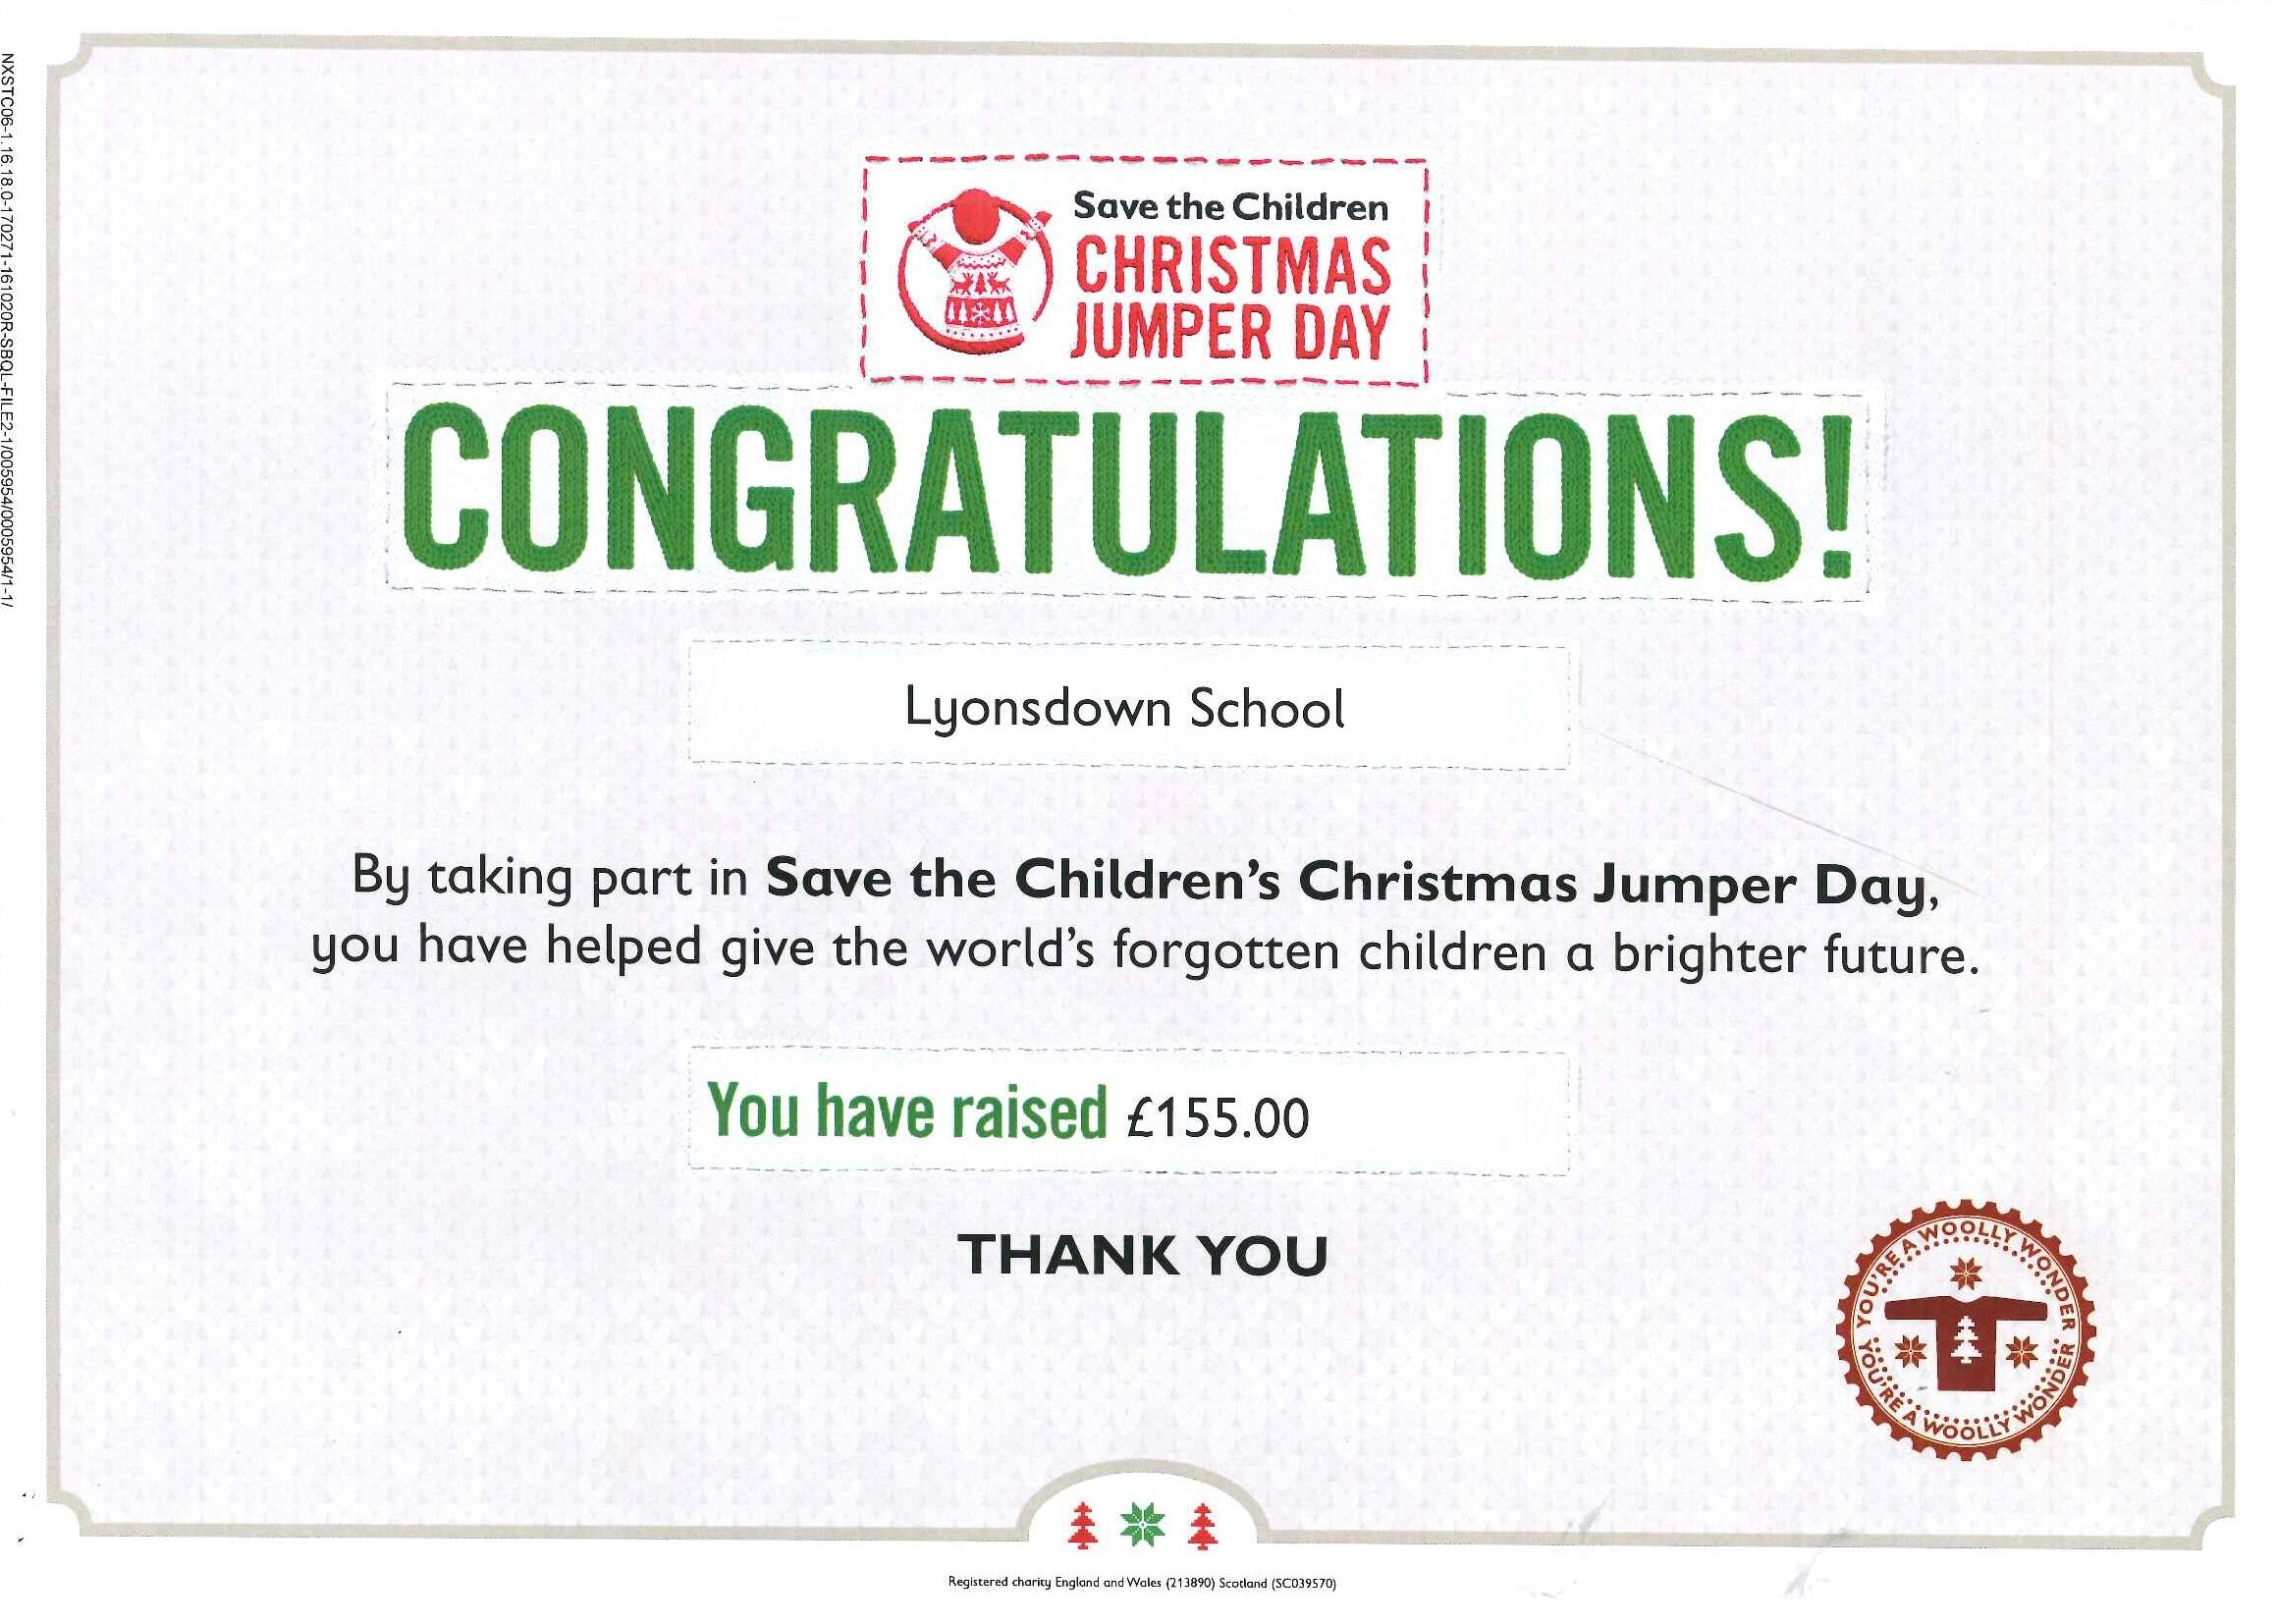 Save the Childrens' Christmas Jumper Day   Lyonsdown School